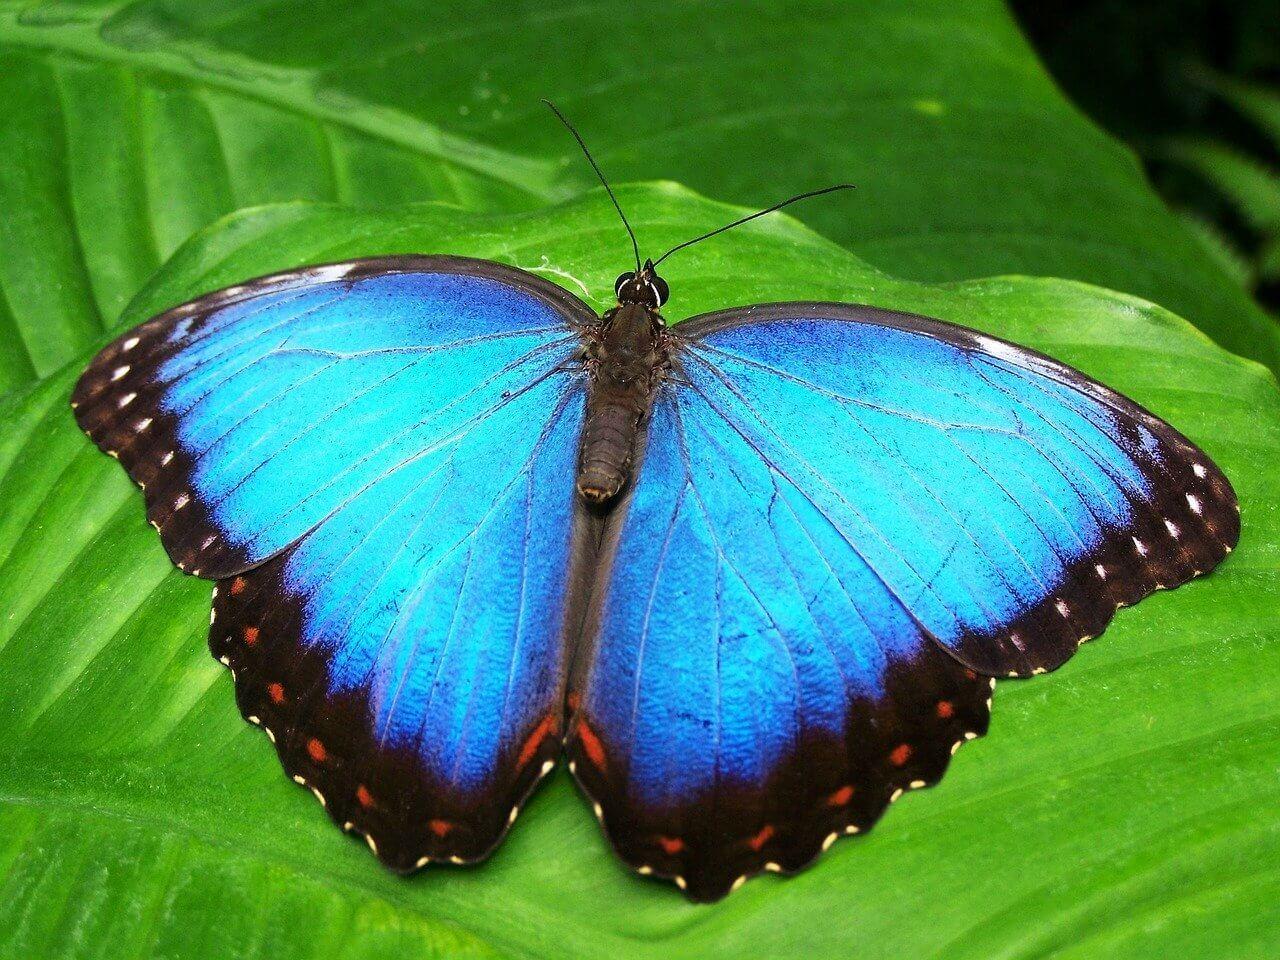 Blue Morphofalter - Original image